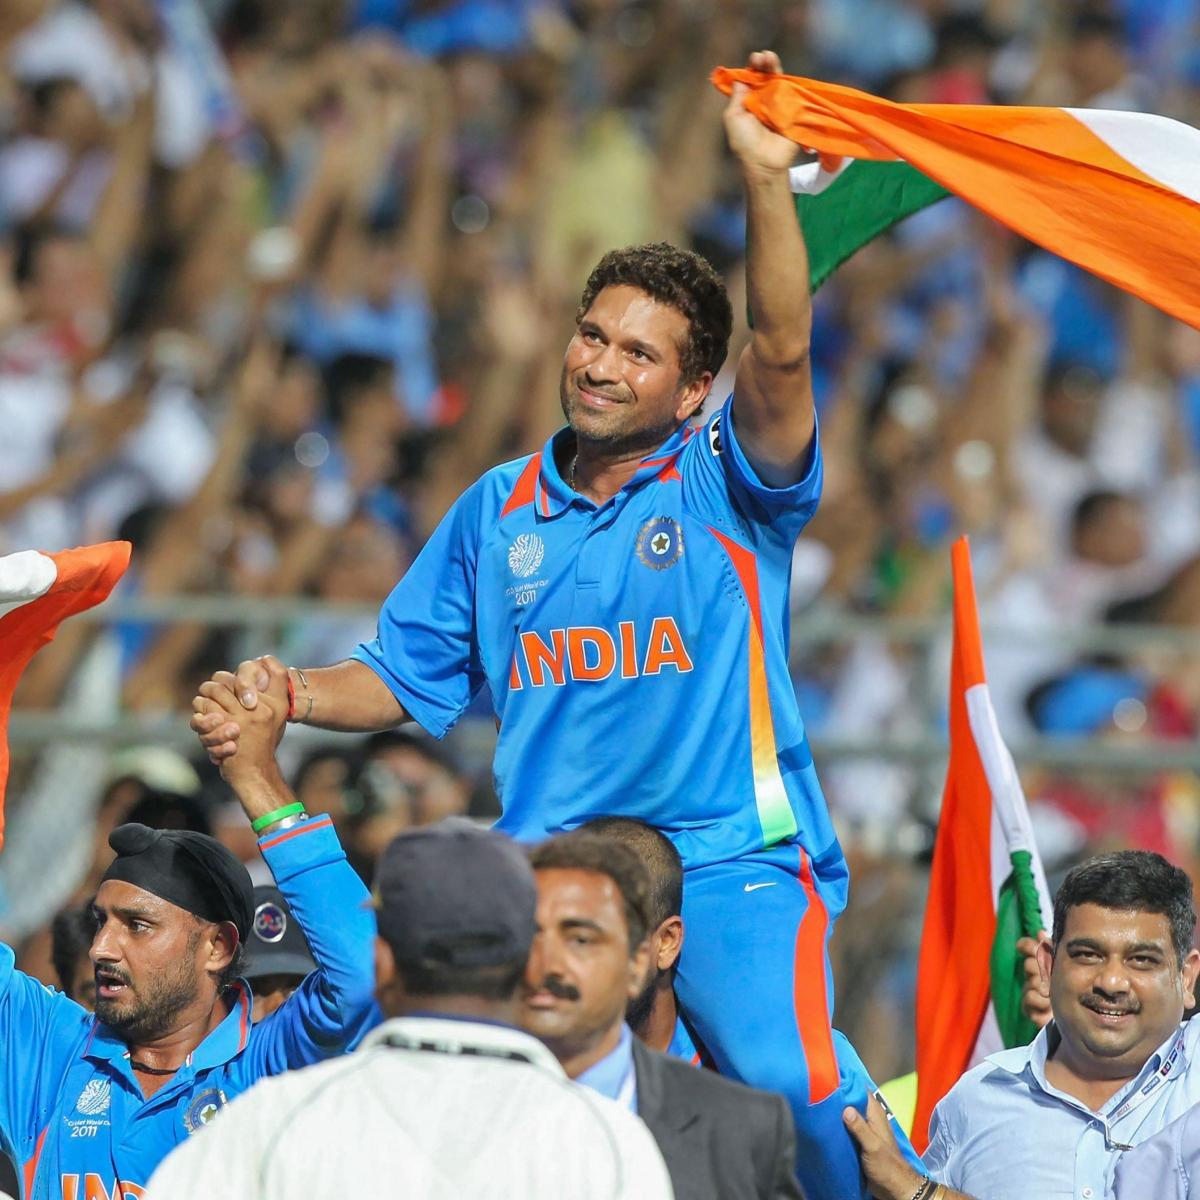 When a carefree Tendulkar danced: Harbhajan Singh recalls fond 2011 World Cup memories